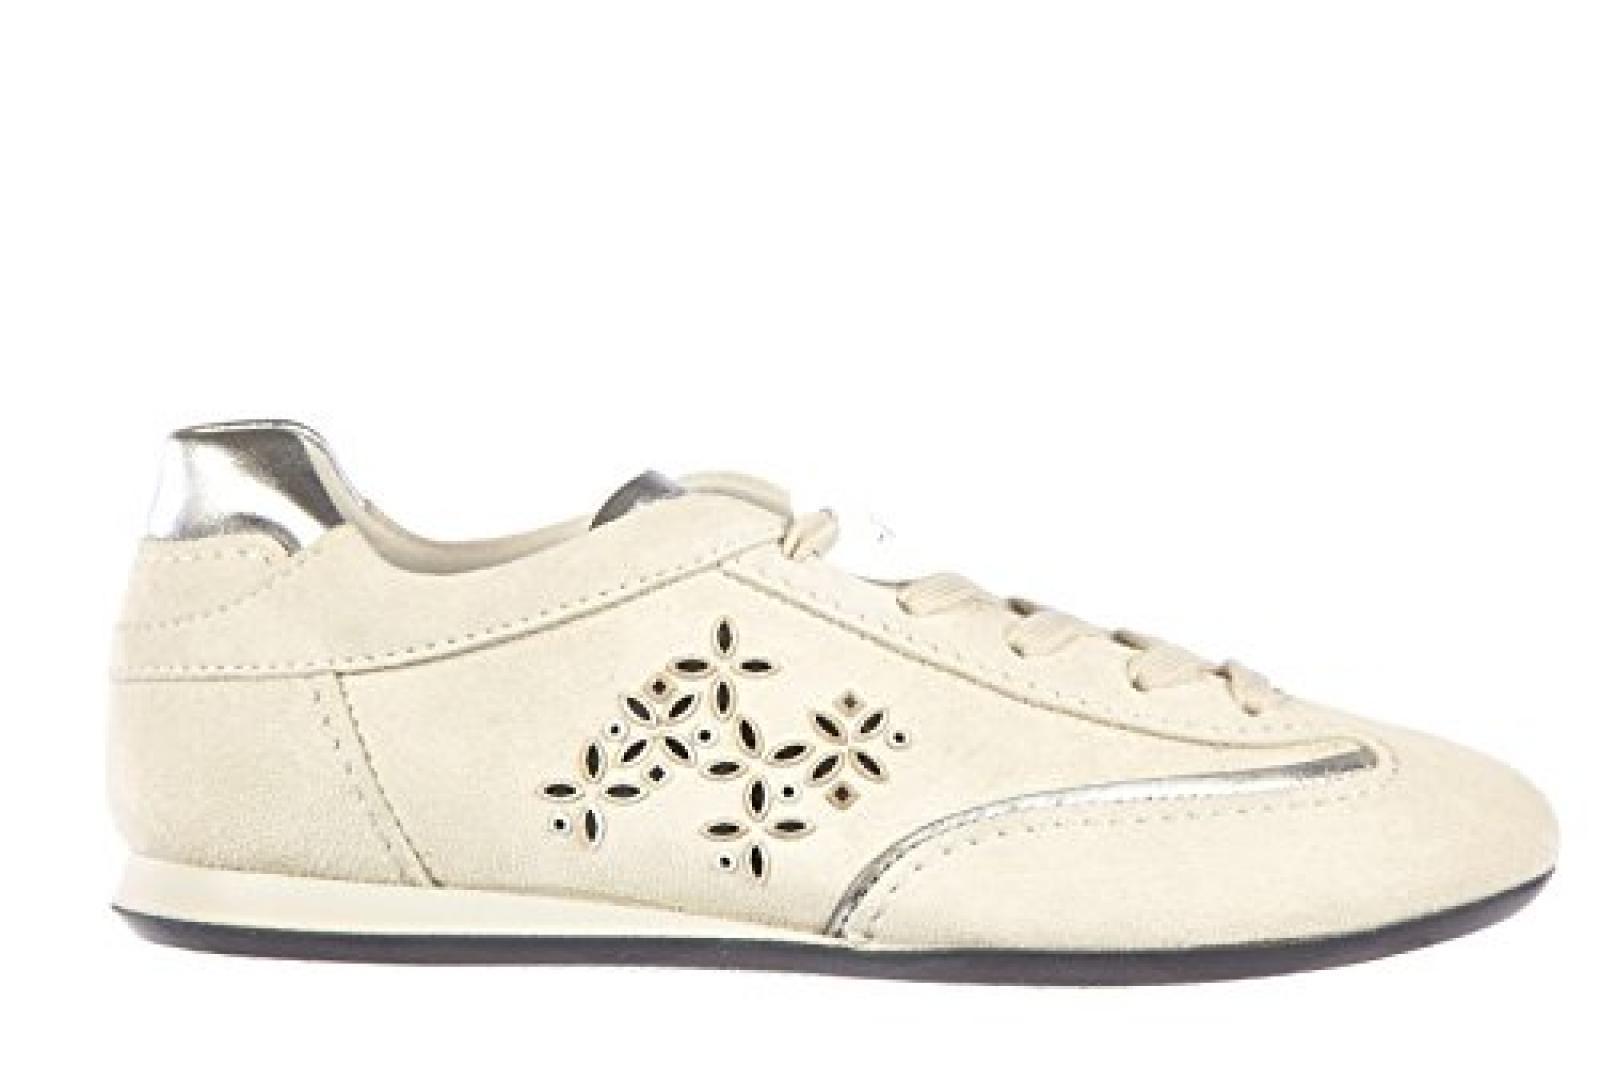 Hogan Damenschuhe Turnschuhe Damen Wildleder Schuhe Sneakers olympya specchietti Weiß